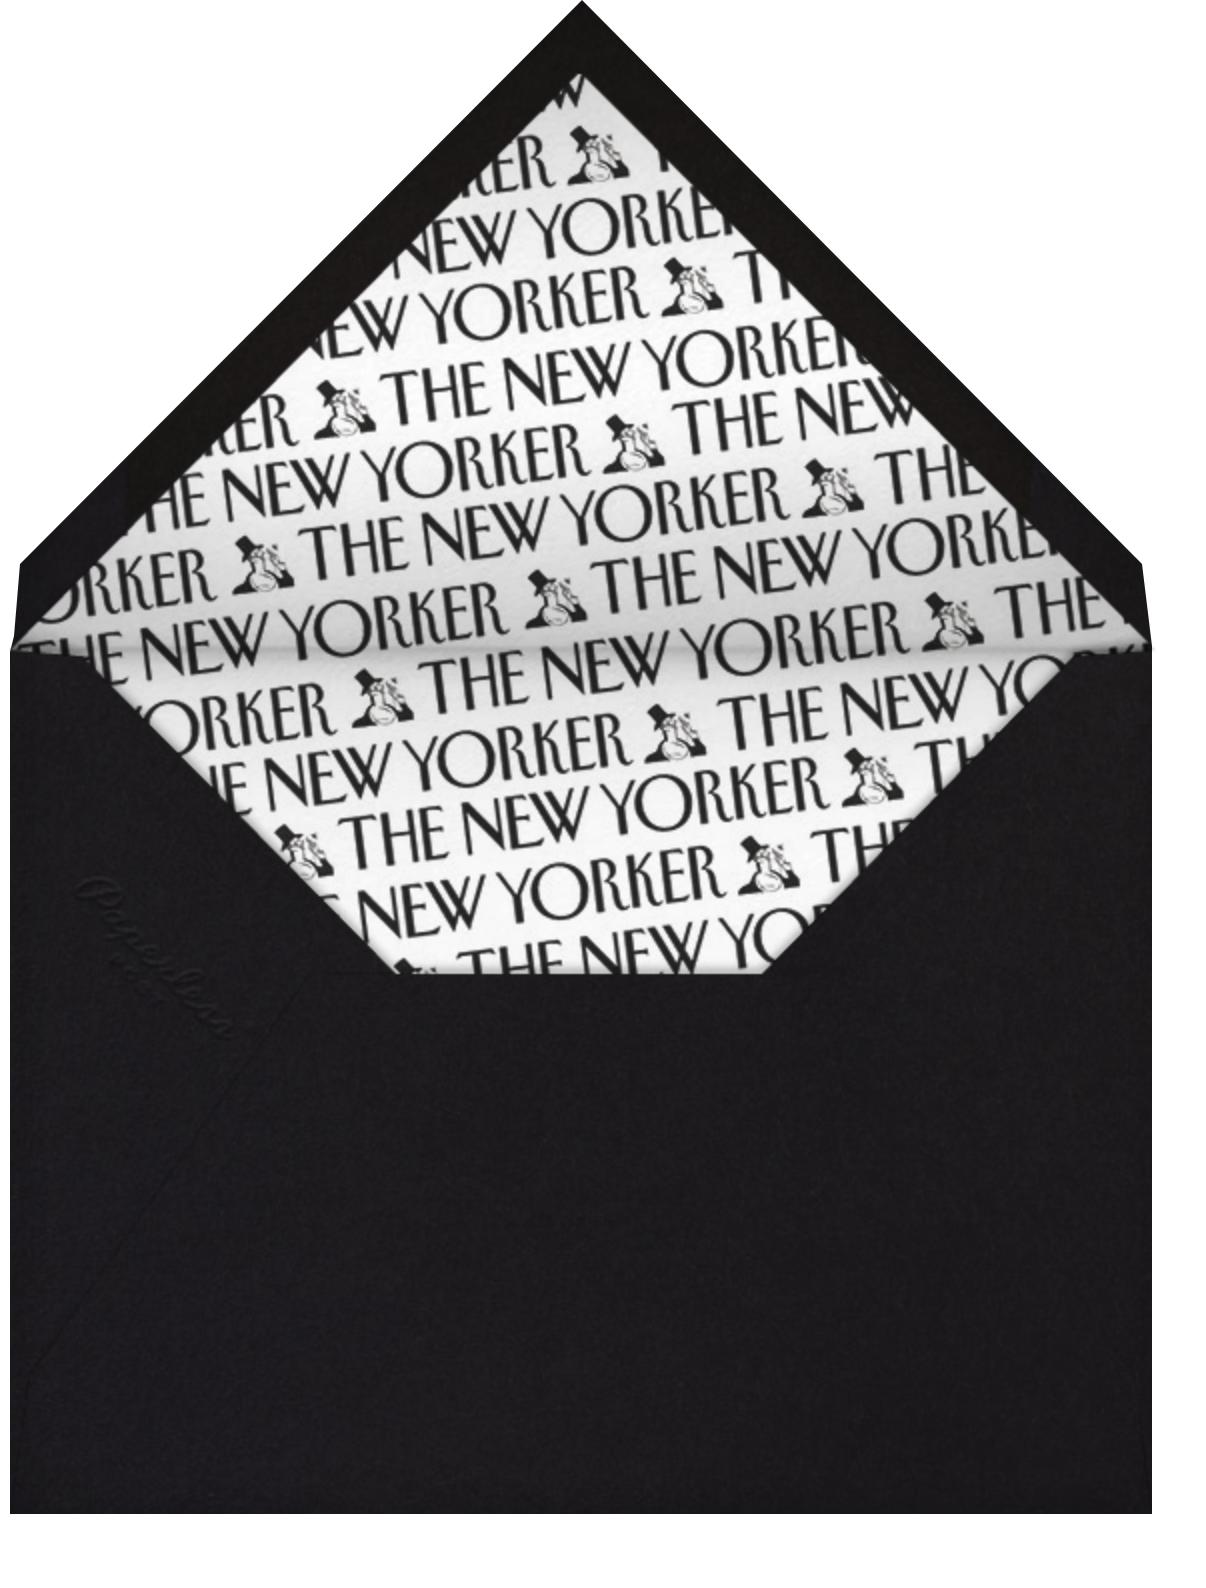 Cakeless - The New Yorker - Funny birthday eCards - envelope back